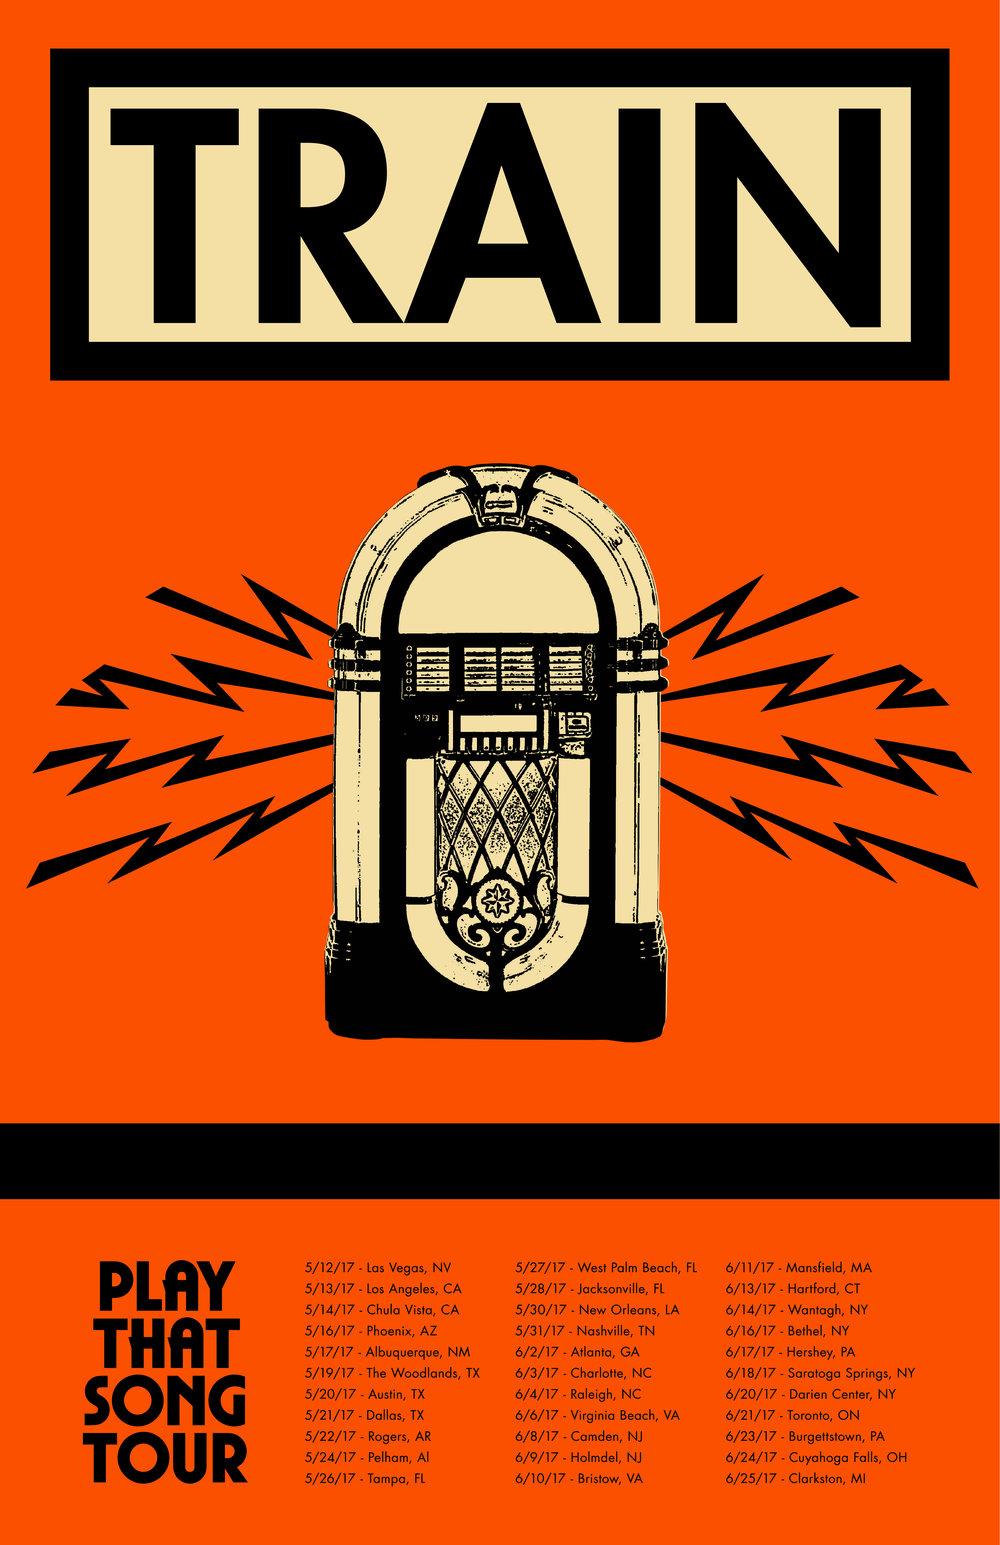 Train_12-19-16_Separated-01.jpg